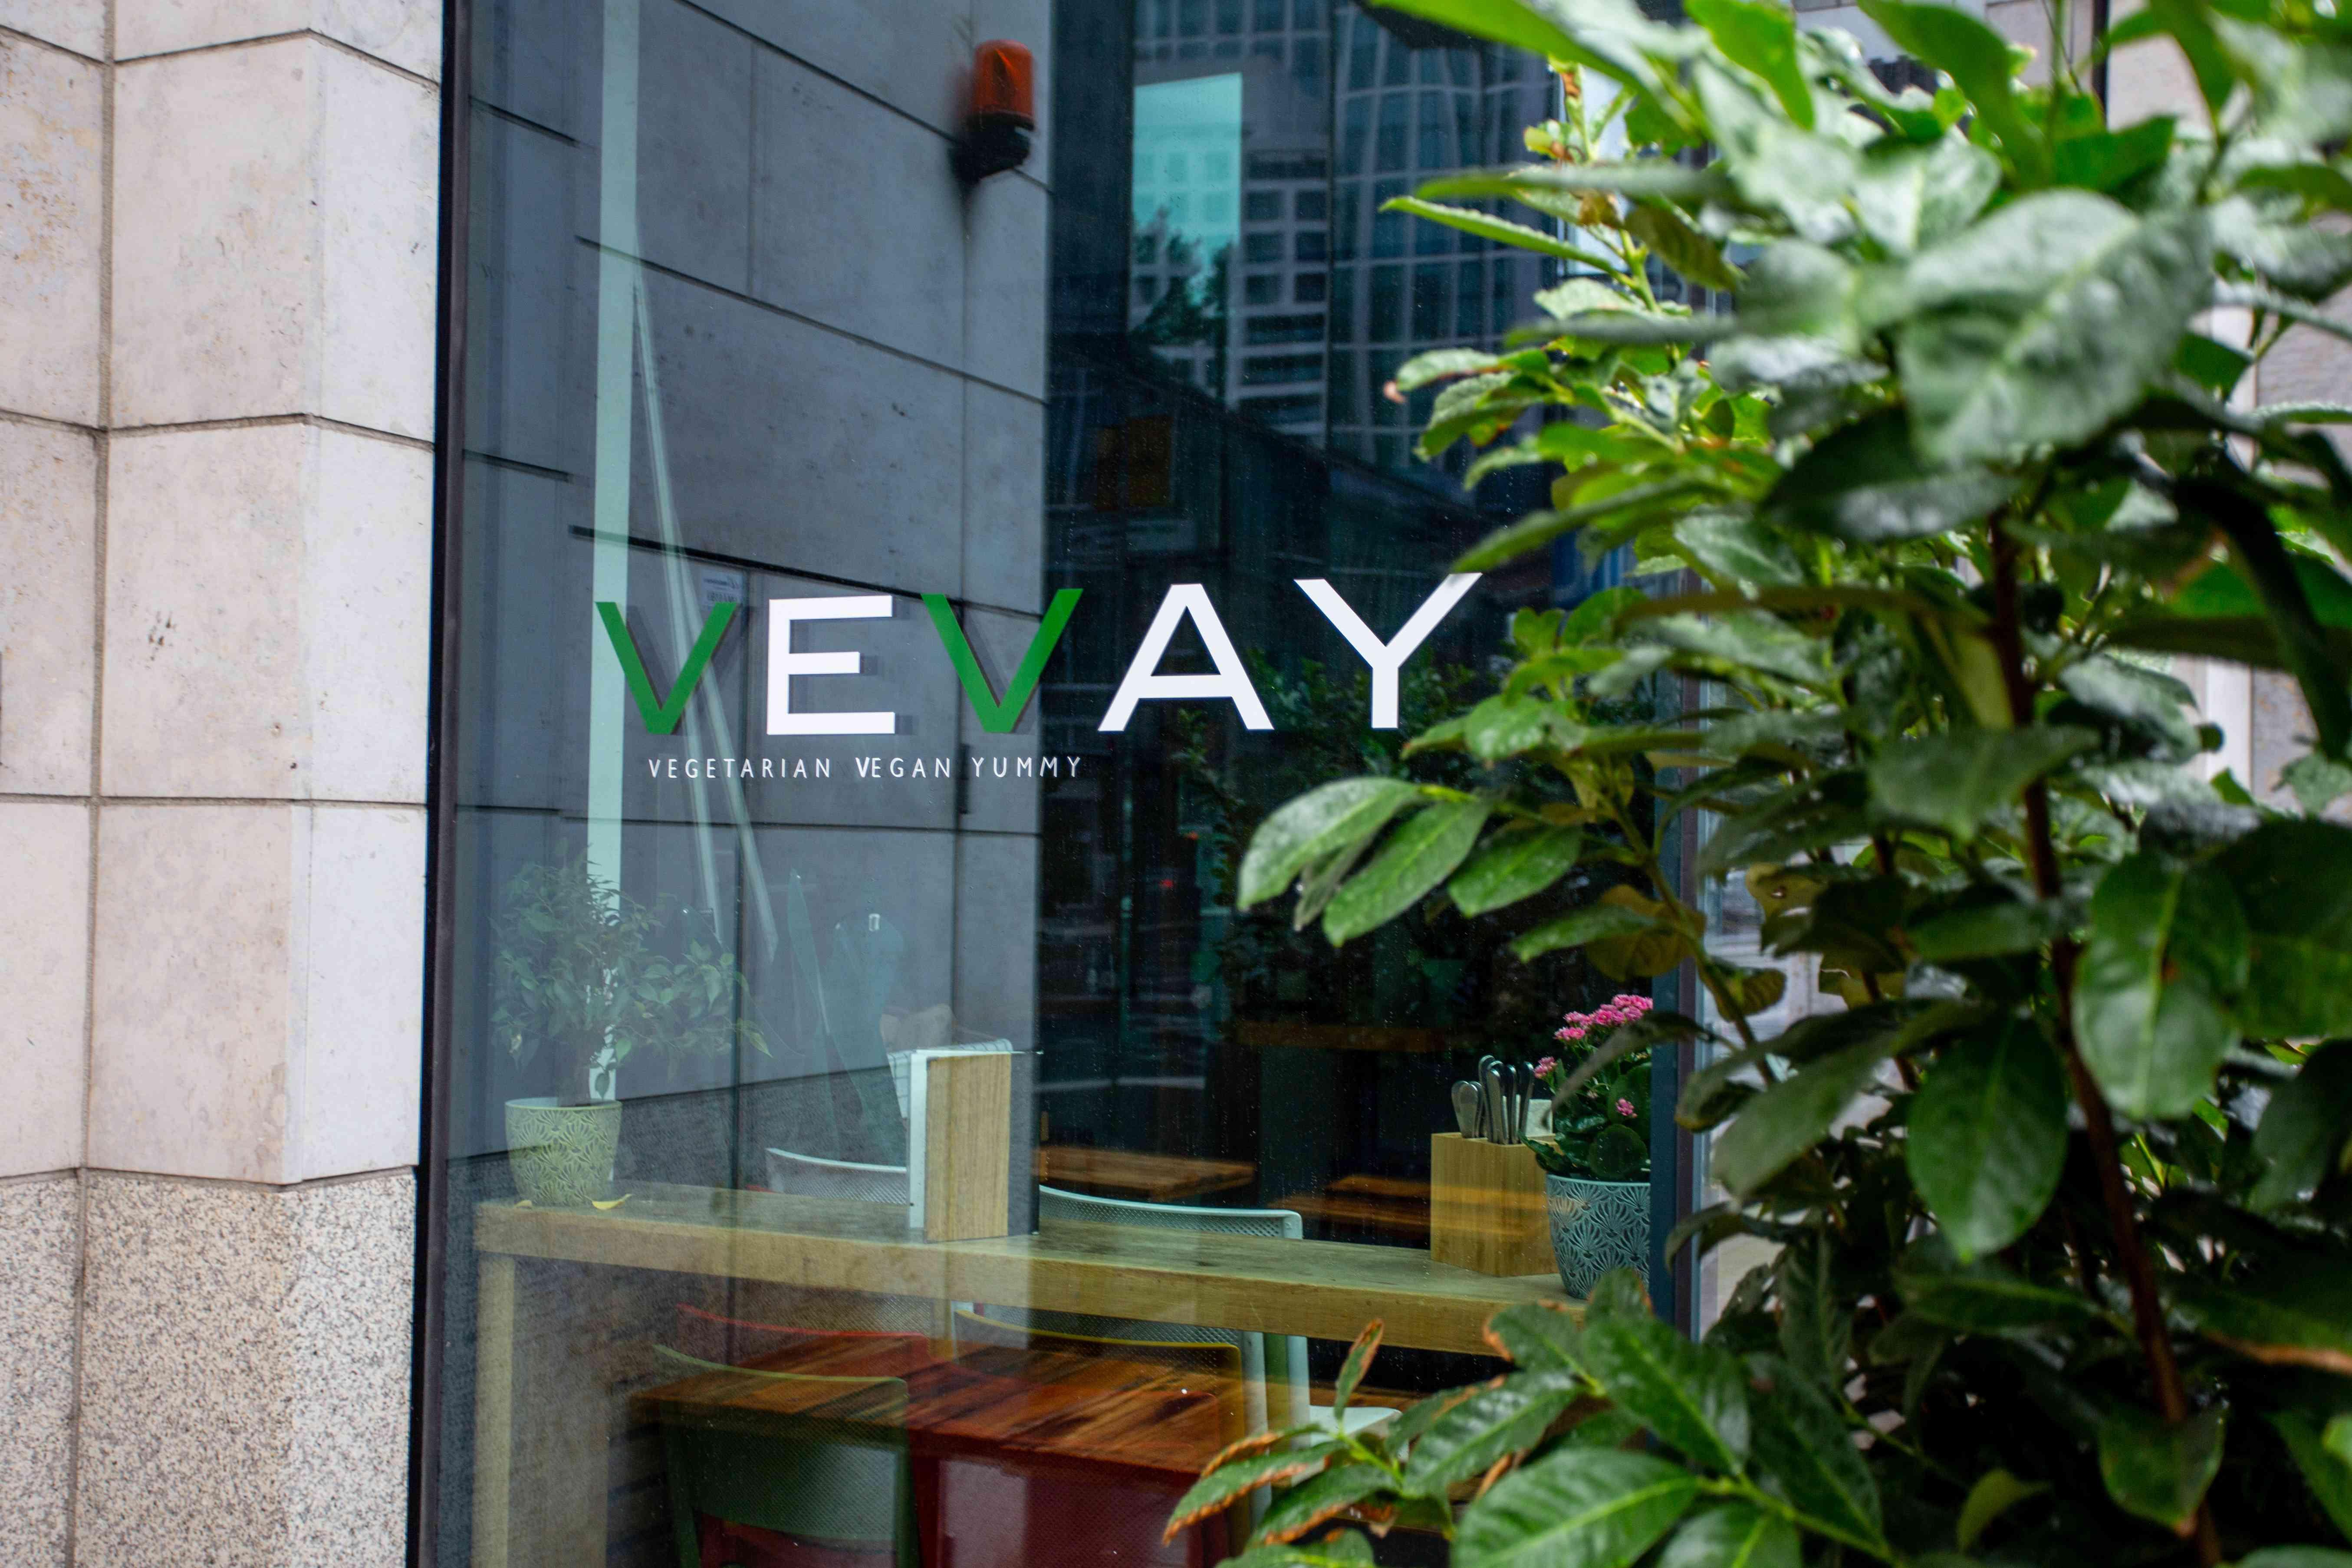 Window and logo of Vevay